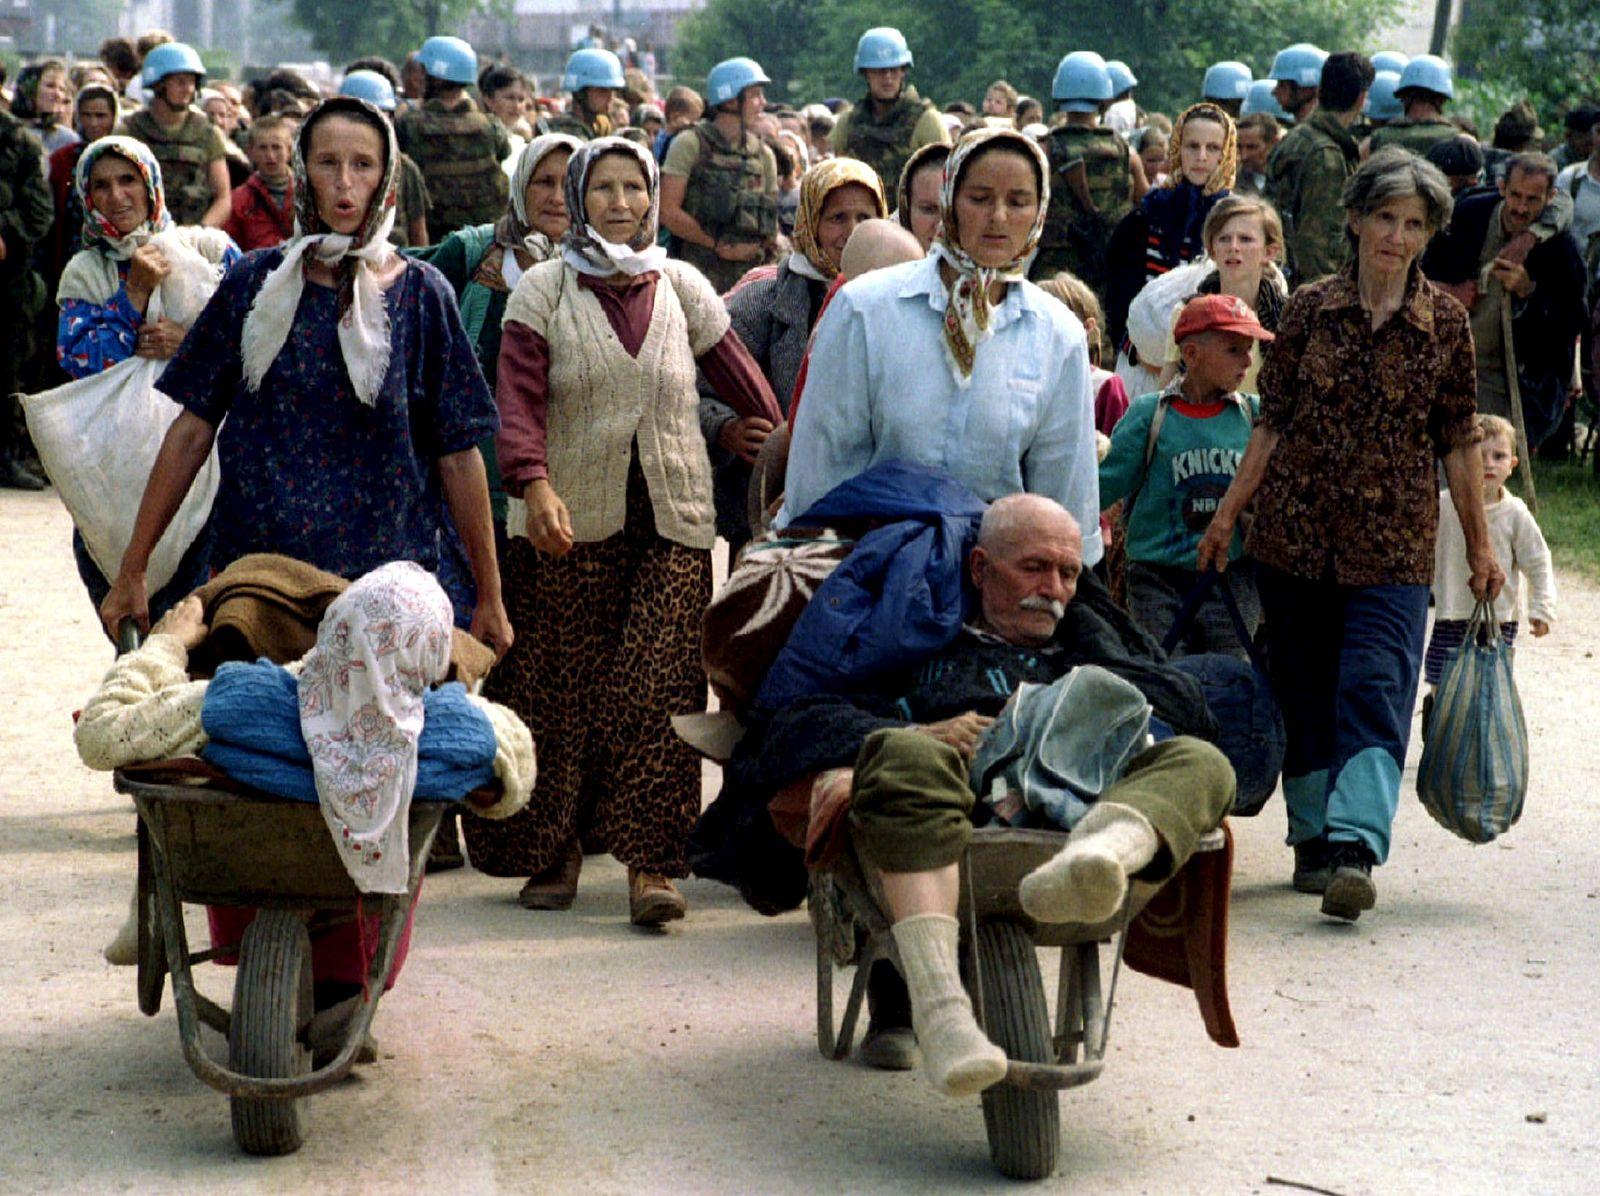 Massaker von Srebenica / Flüchtlinge